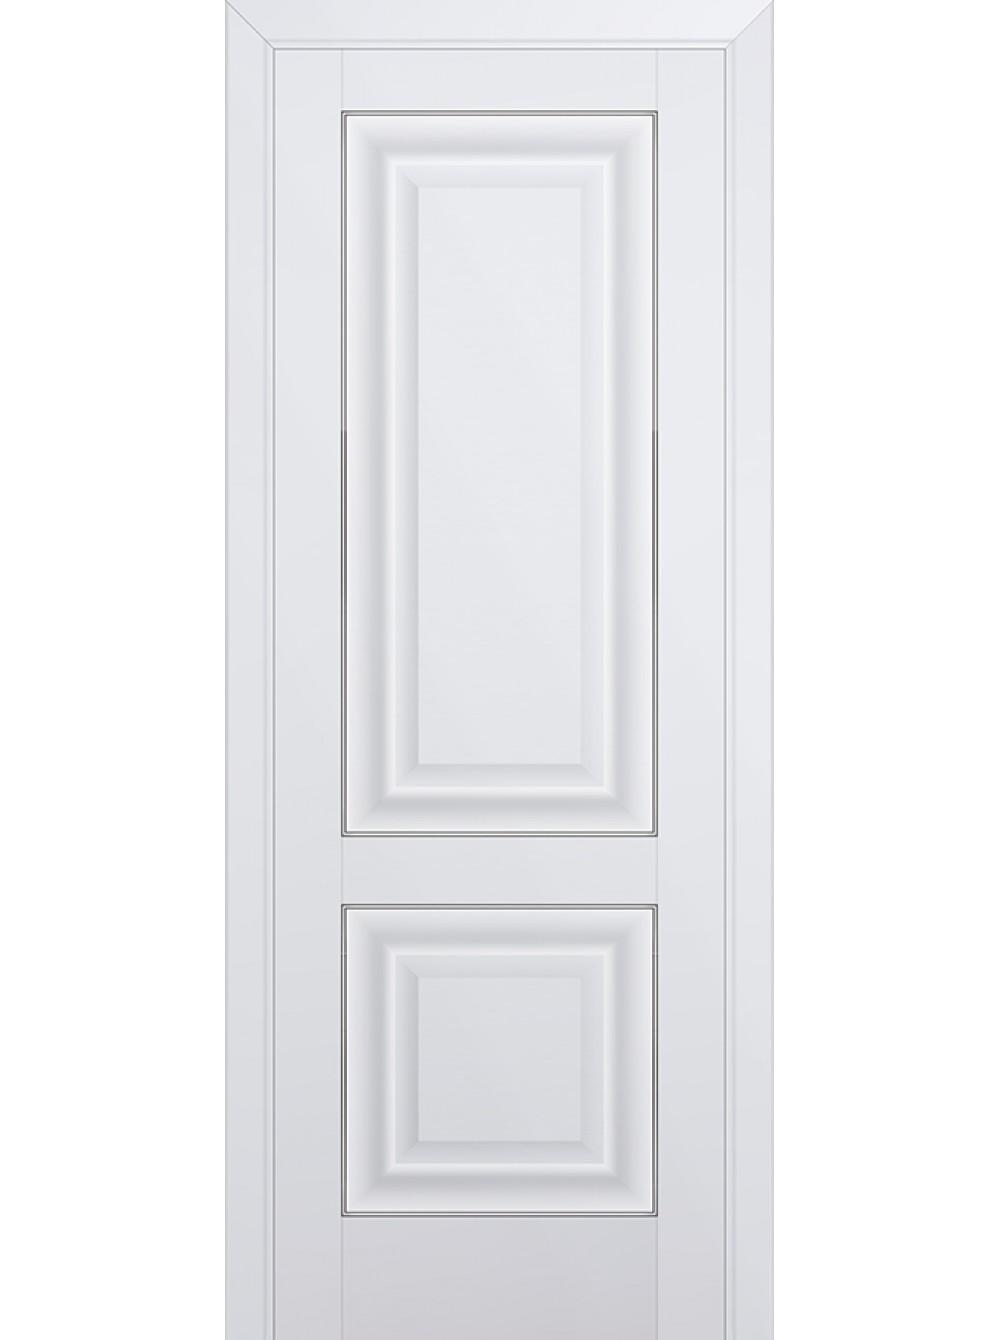 Комплект раздвижной двери Profildoors 27U (Аляска) 2000х900х36 мм (коробка, наличники, добор) фото